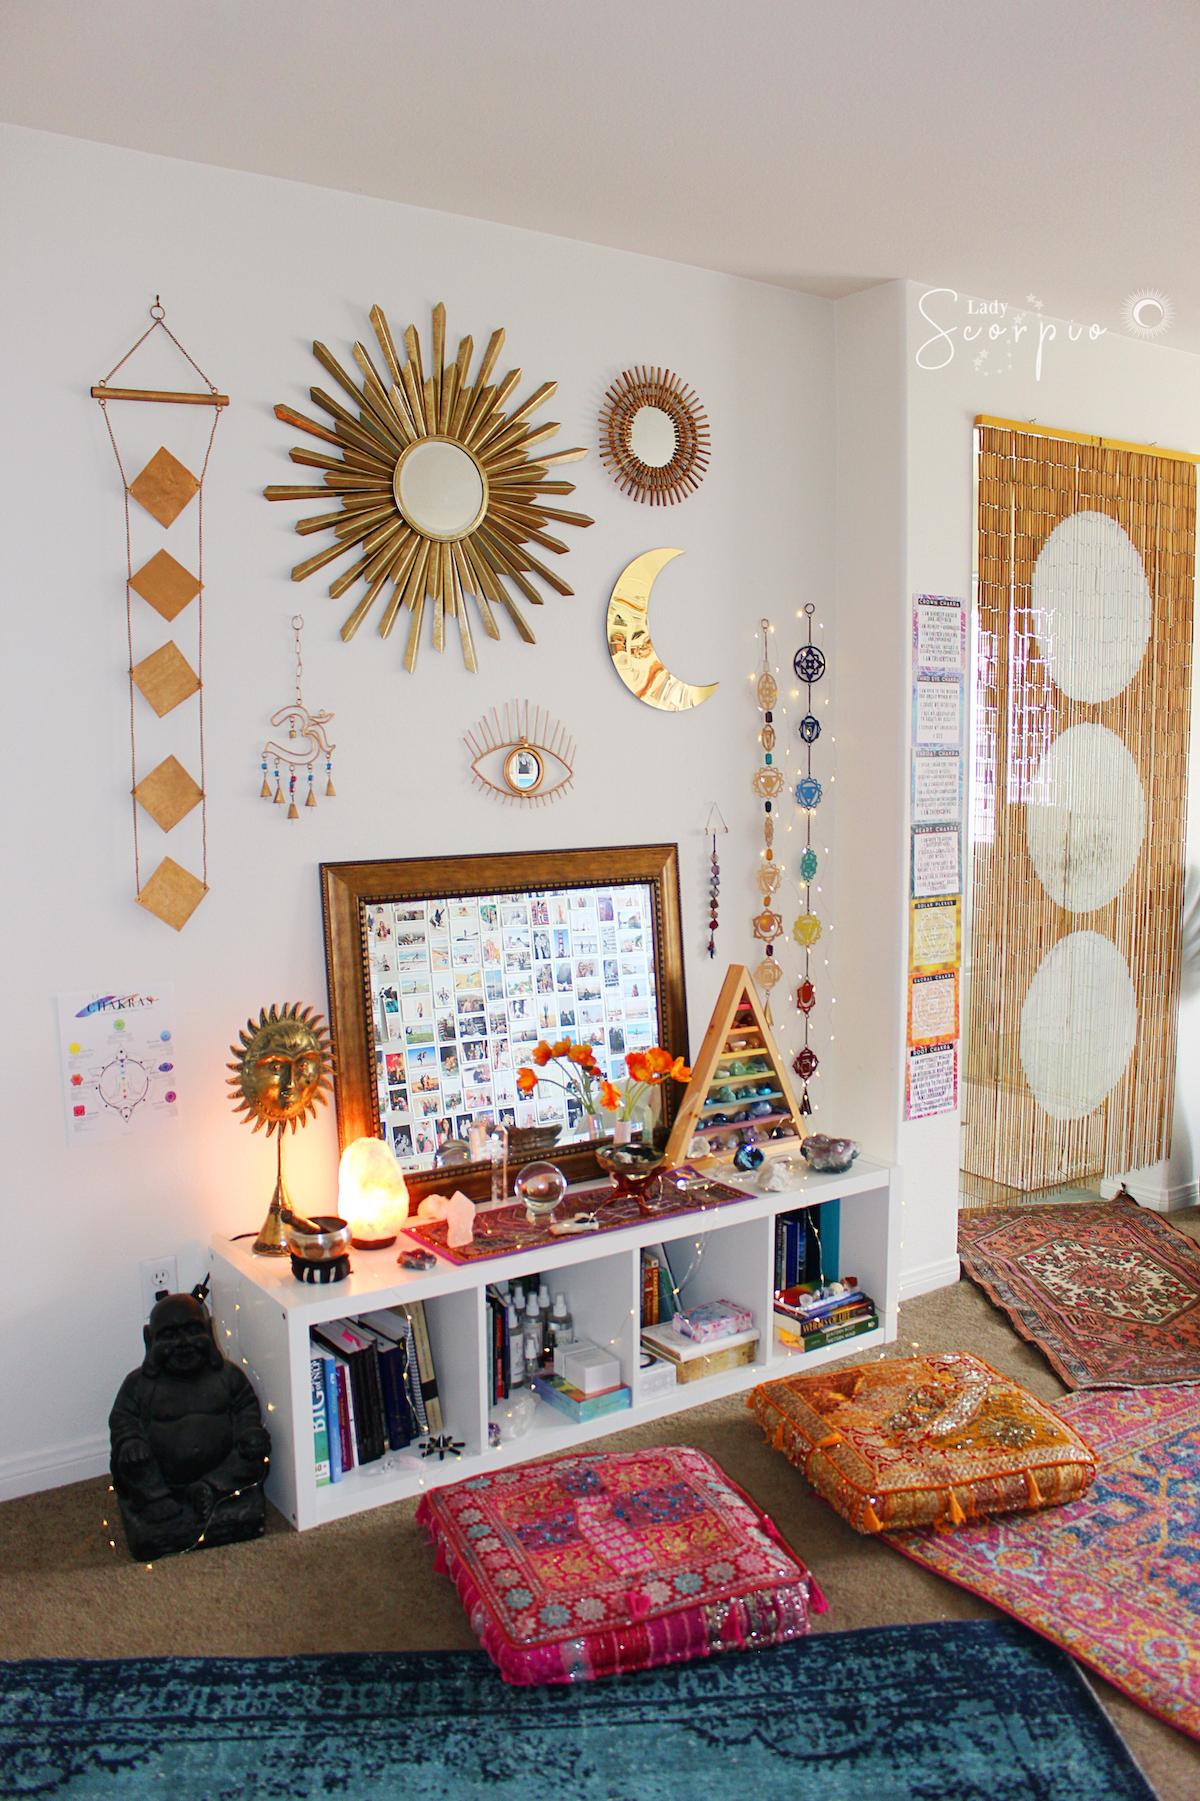 Chakra Awakening Wall Hanging Meditation Room Home Decor Decor